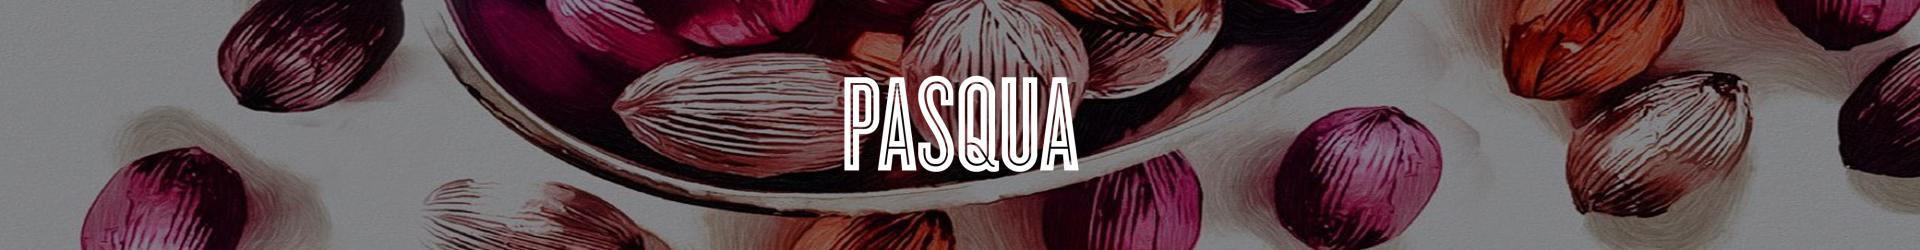 GraficaPasqua_Tavola disegno 1